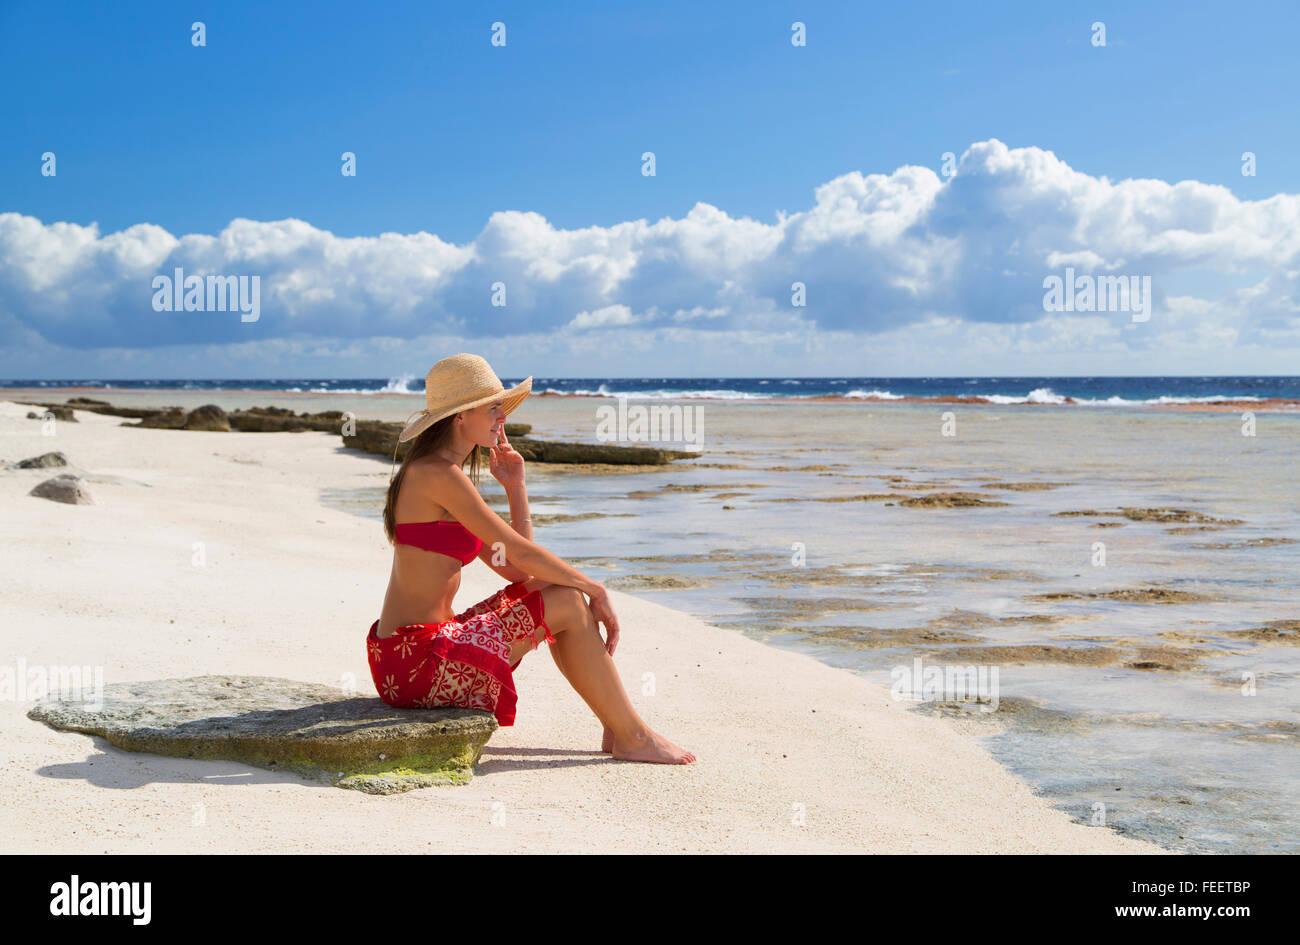 Woman sitting on beach, Fakarava, Tuamotu Islands, French Polynesia - Stock Image